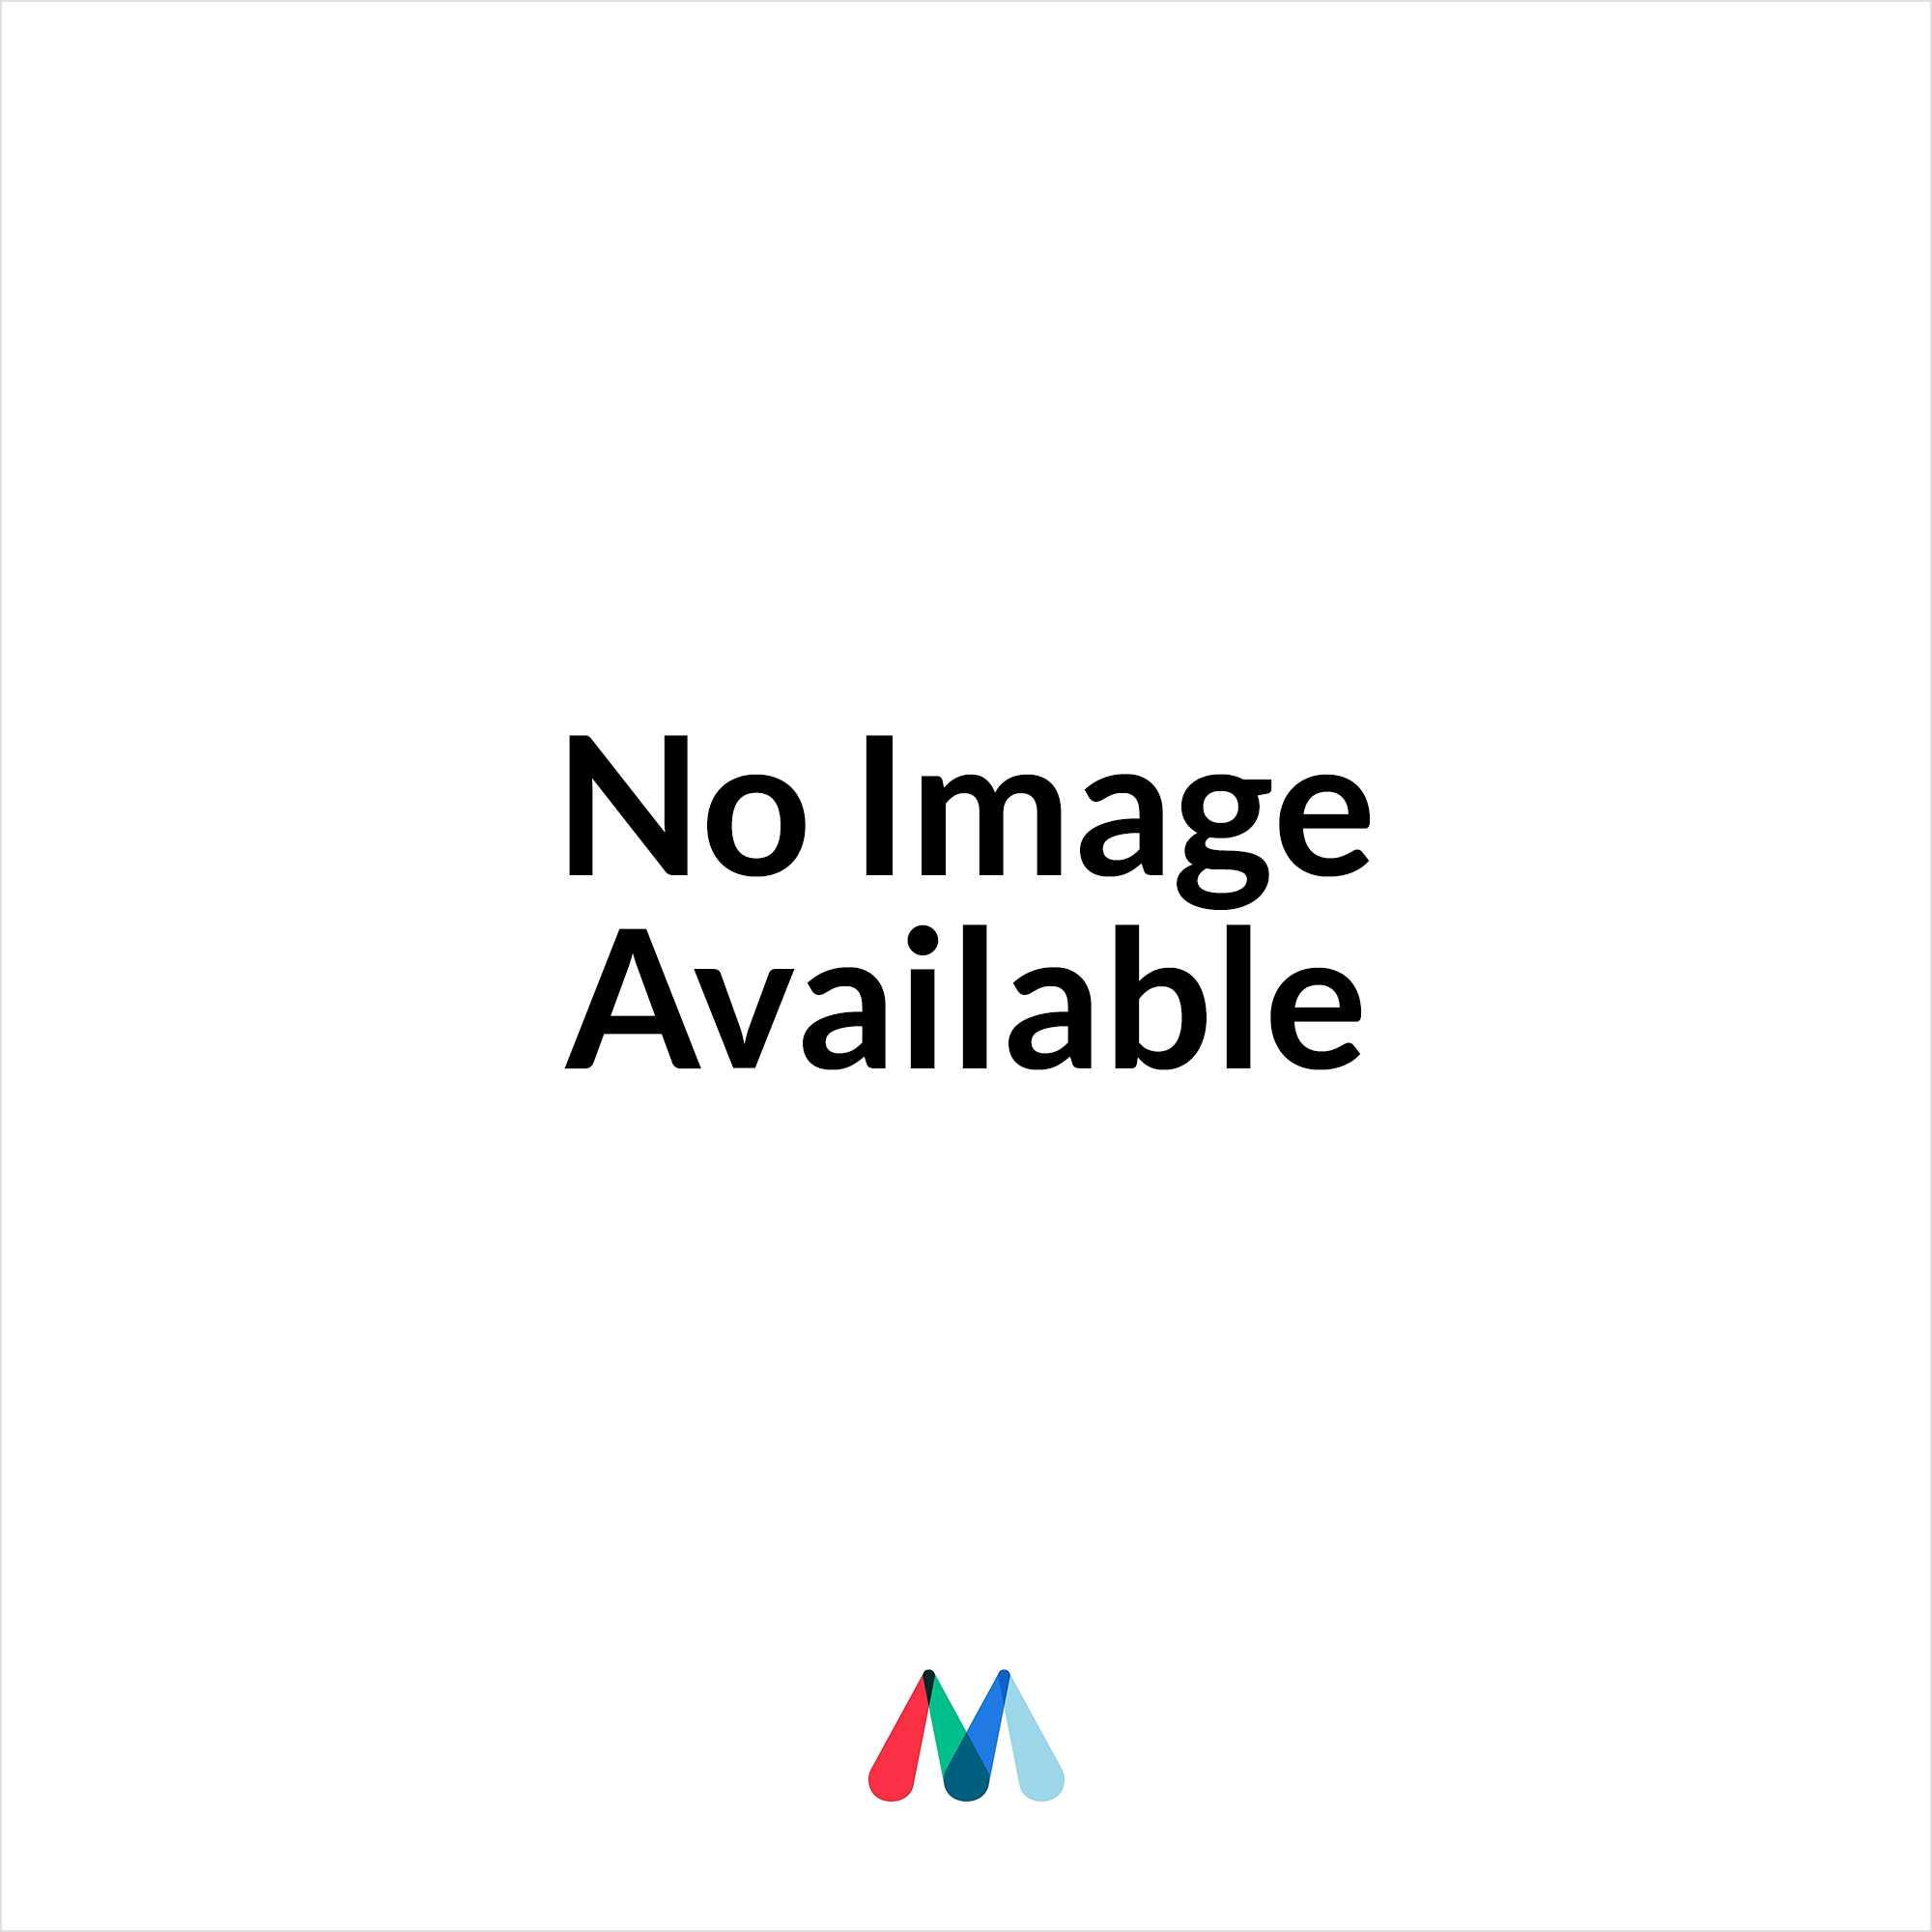 LuxR LED lighting Modux 2 watt - Round with Bracket- Stainless Steel